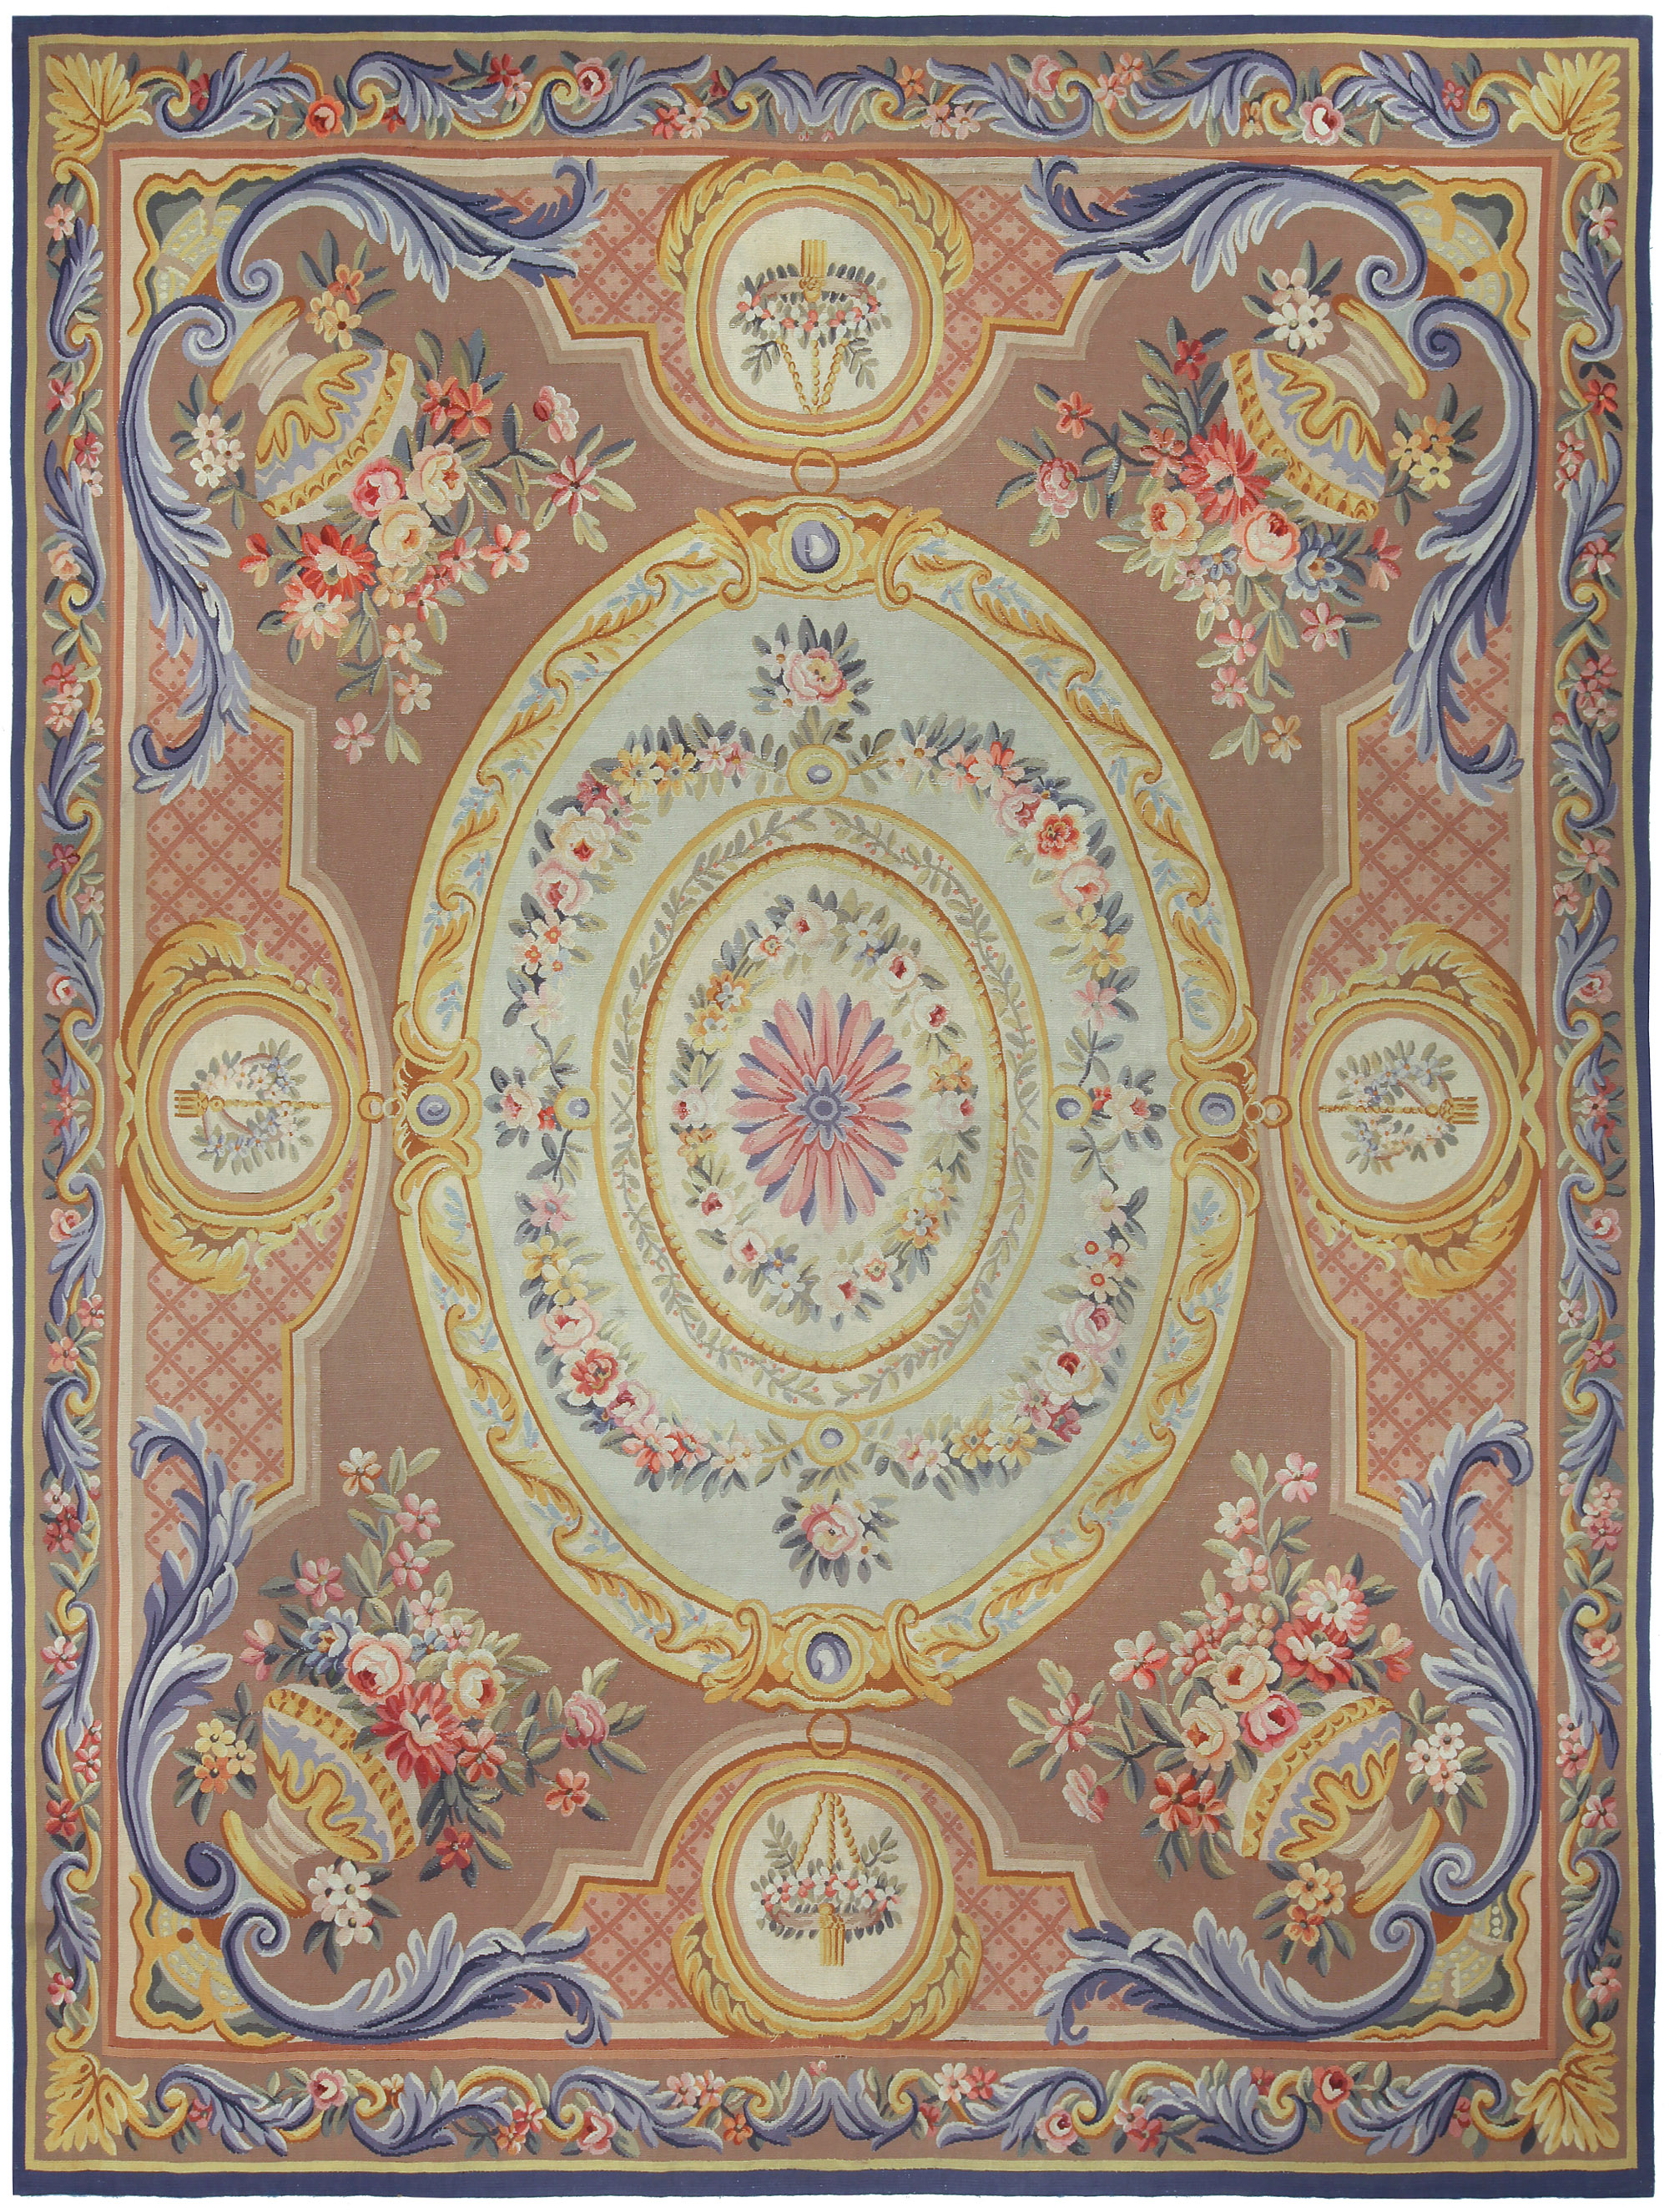 French Aubusson Rugs by Doris Leslie Blau New York